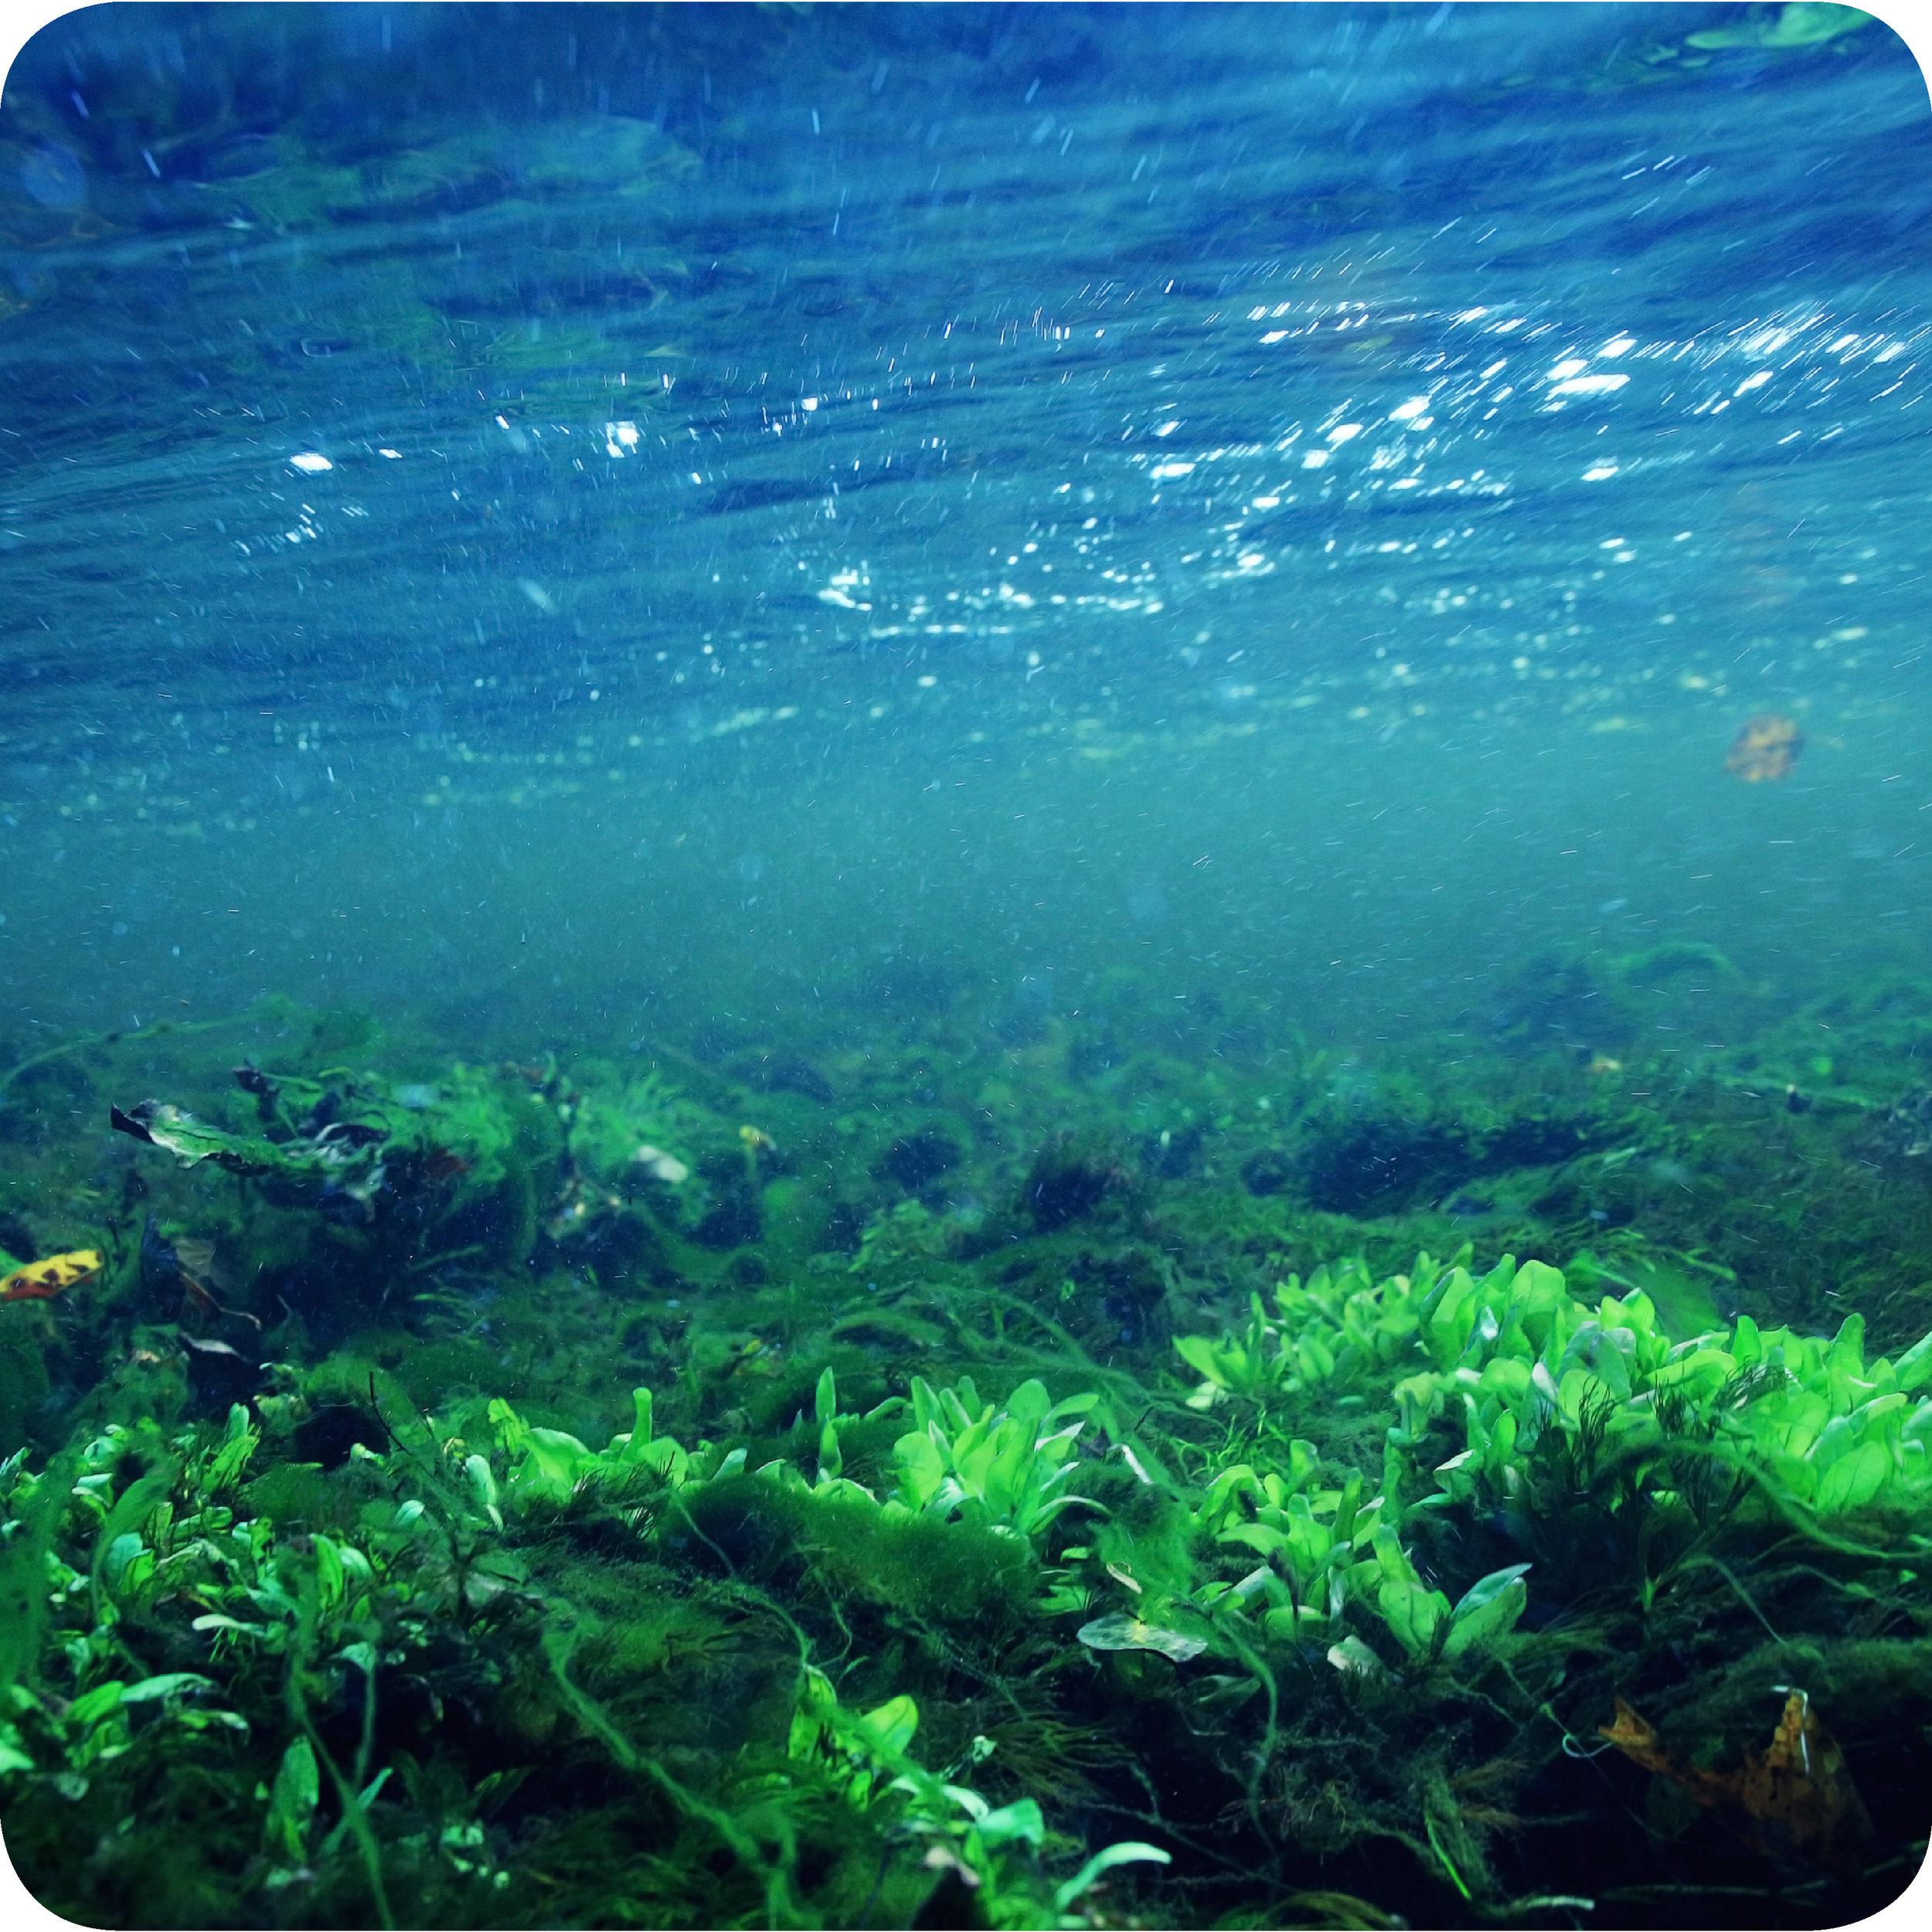 A lush ocean habitat, which is a prime location for blue-green algae growth.